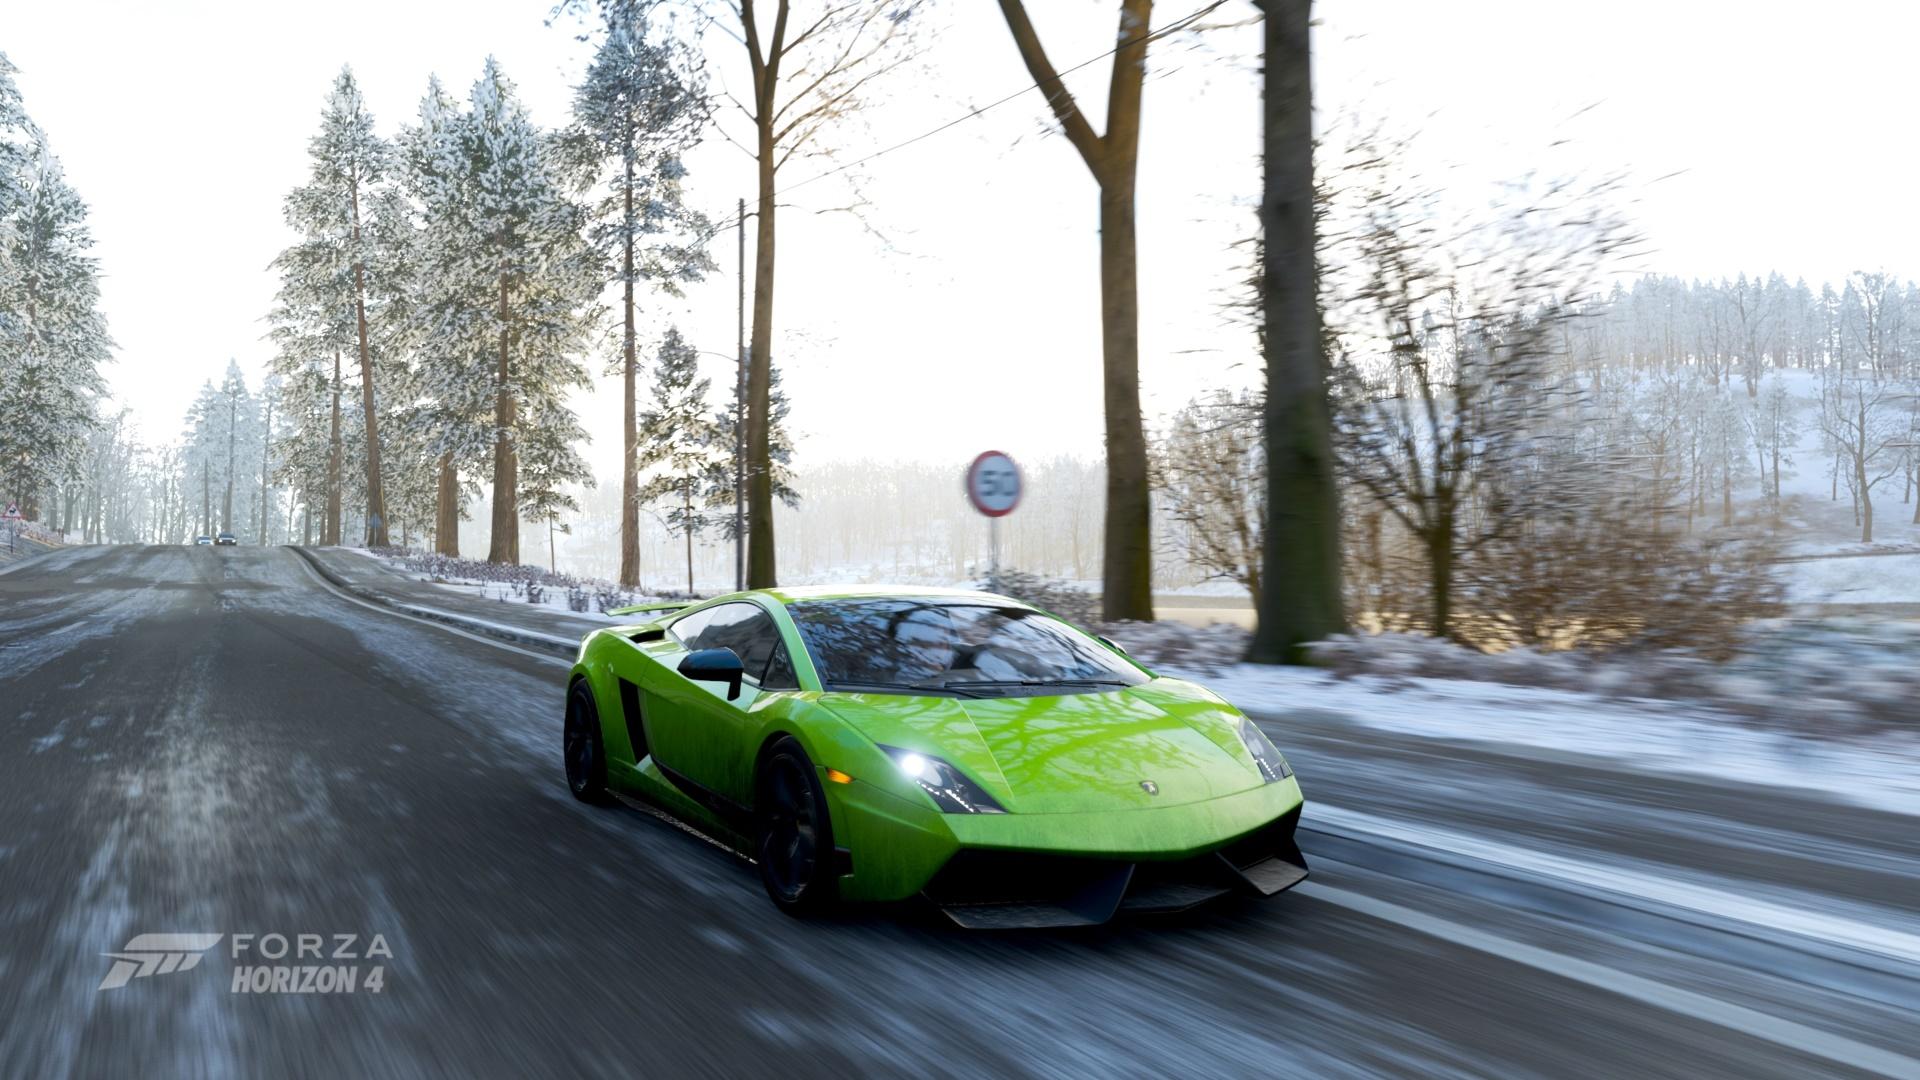 Installation instructions Forza Motorsport 3 version for PC: 1. UnZip Archive 2. Open folder